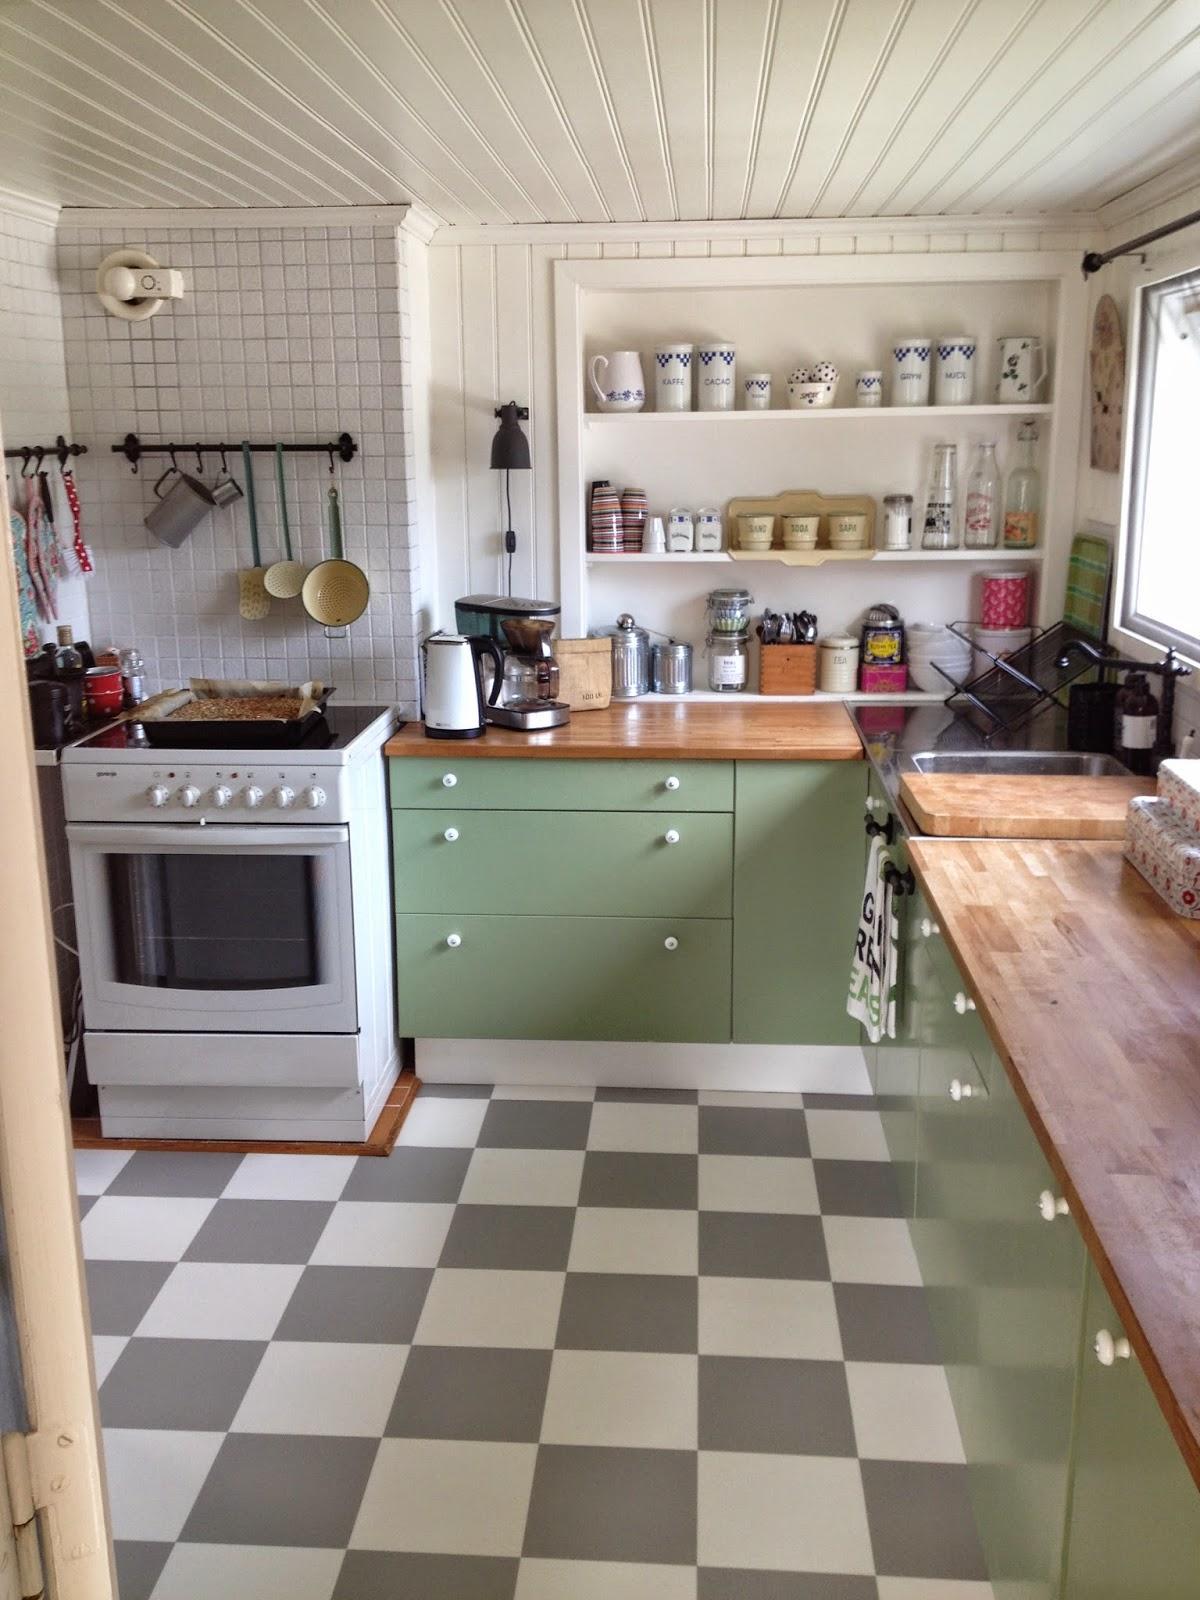 Bla Kok Och Bar Umea : vackra kok alvik  Drottninggatan 102 Per Jansson Stockholm unika